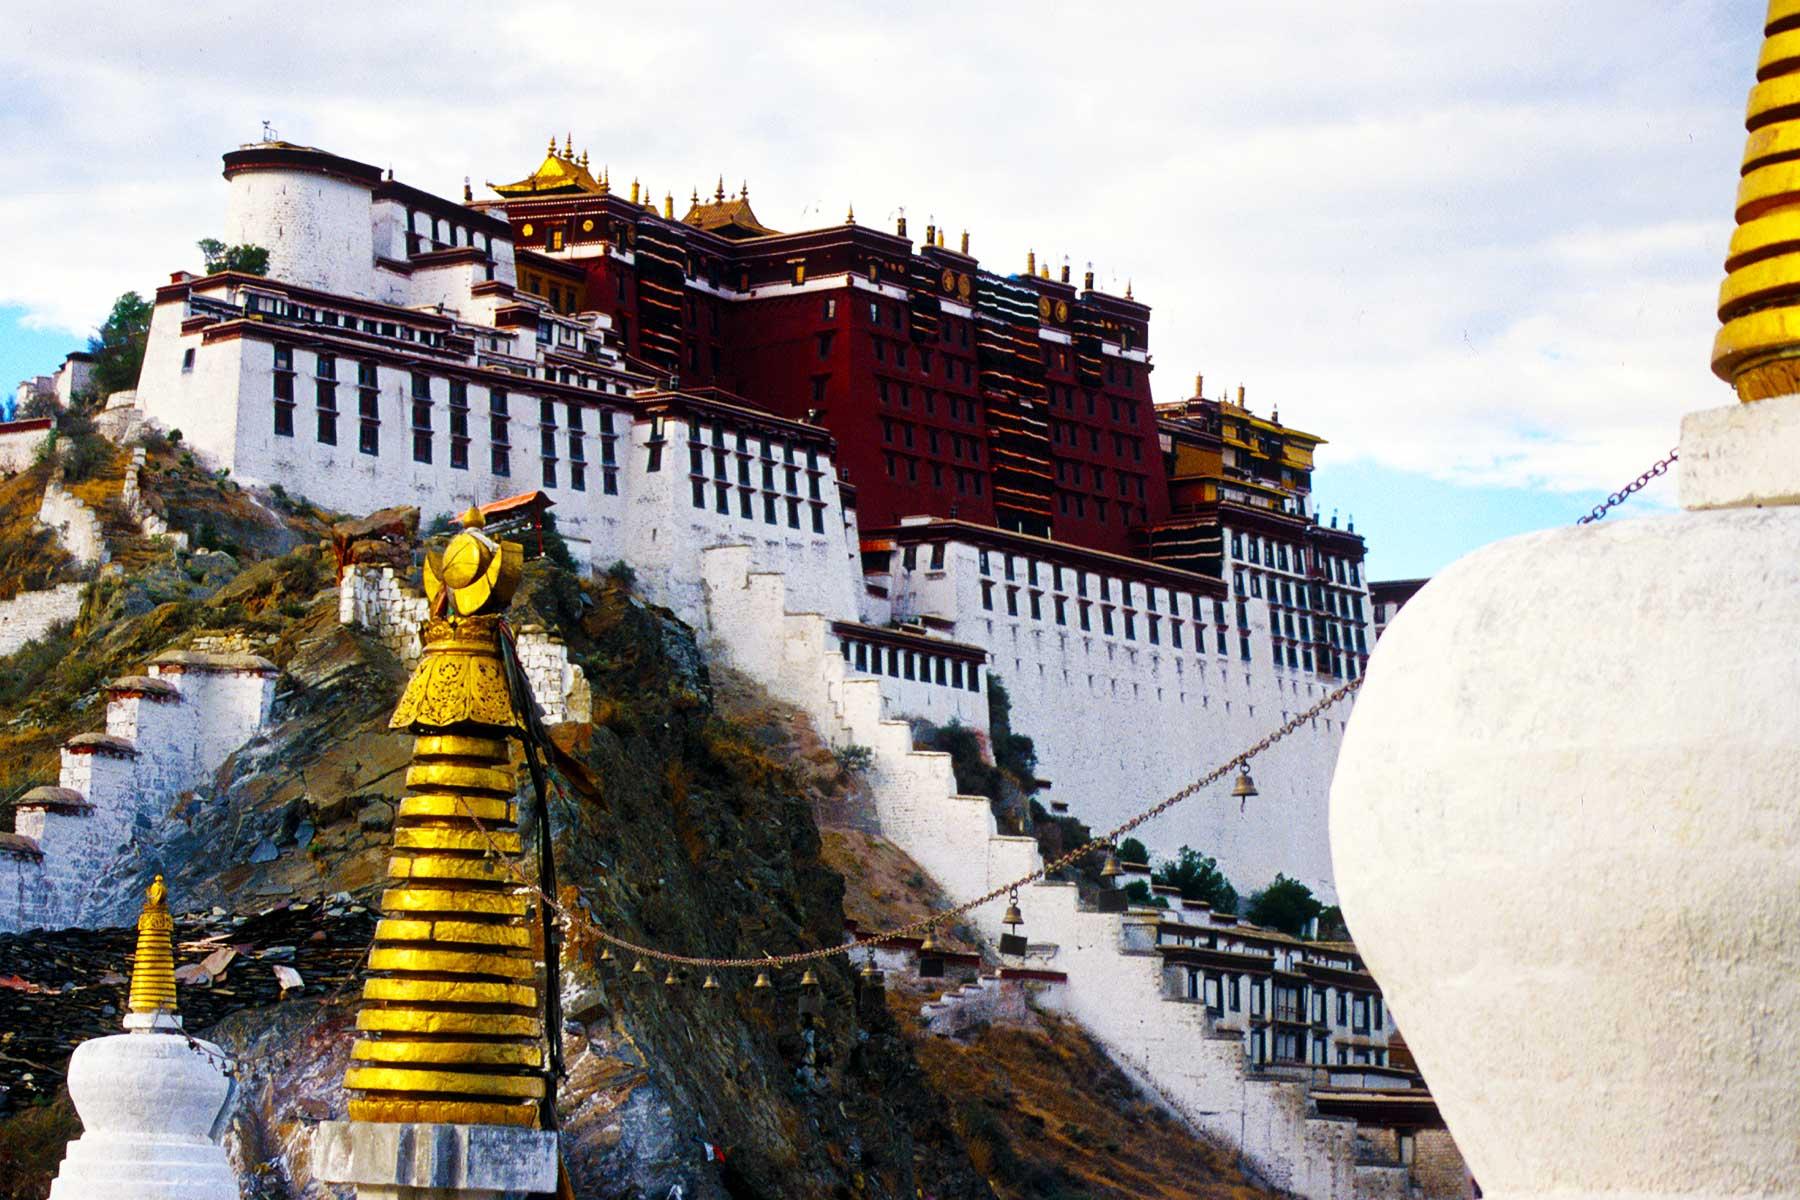 Potala Palace | Former residence of the Dali Lama | Lhasa, Tibet | Steven Martin | Study Abroad Journal